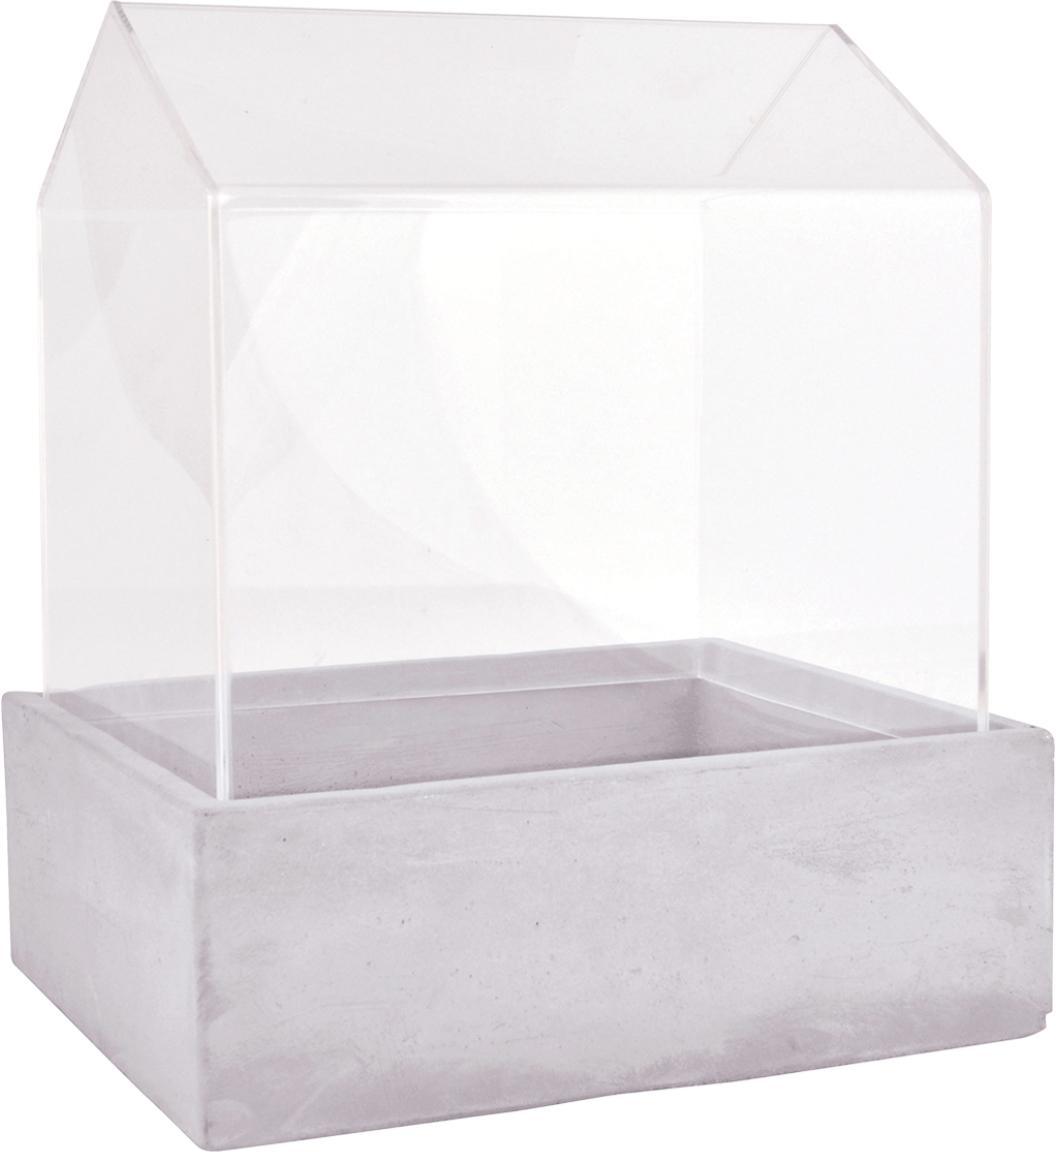 Broeikas Budi, Beton, glas, Grijs, transparant, 24 x 28 cm